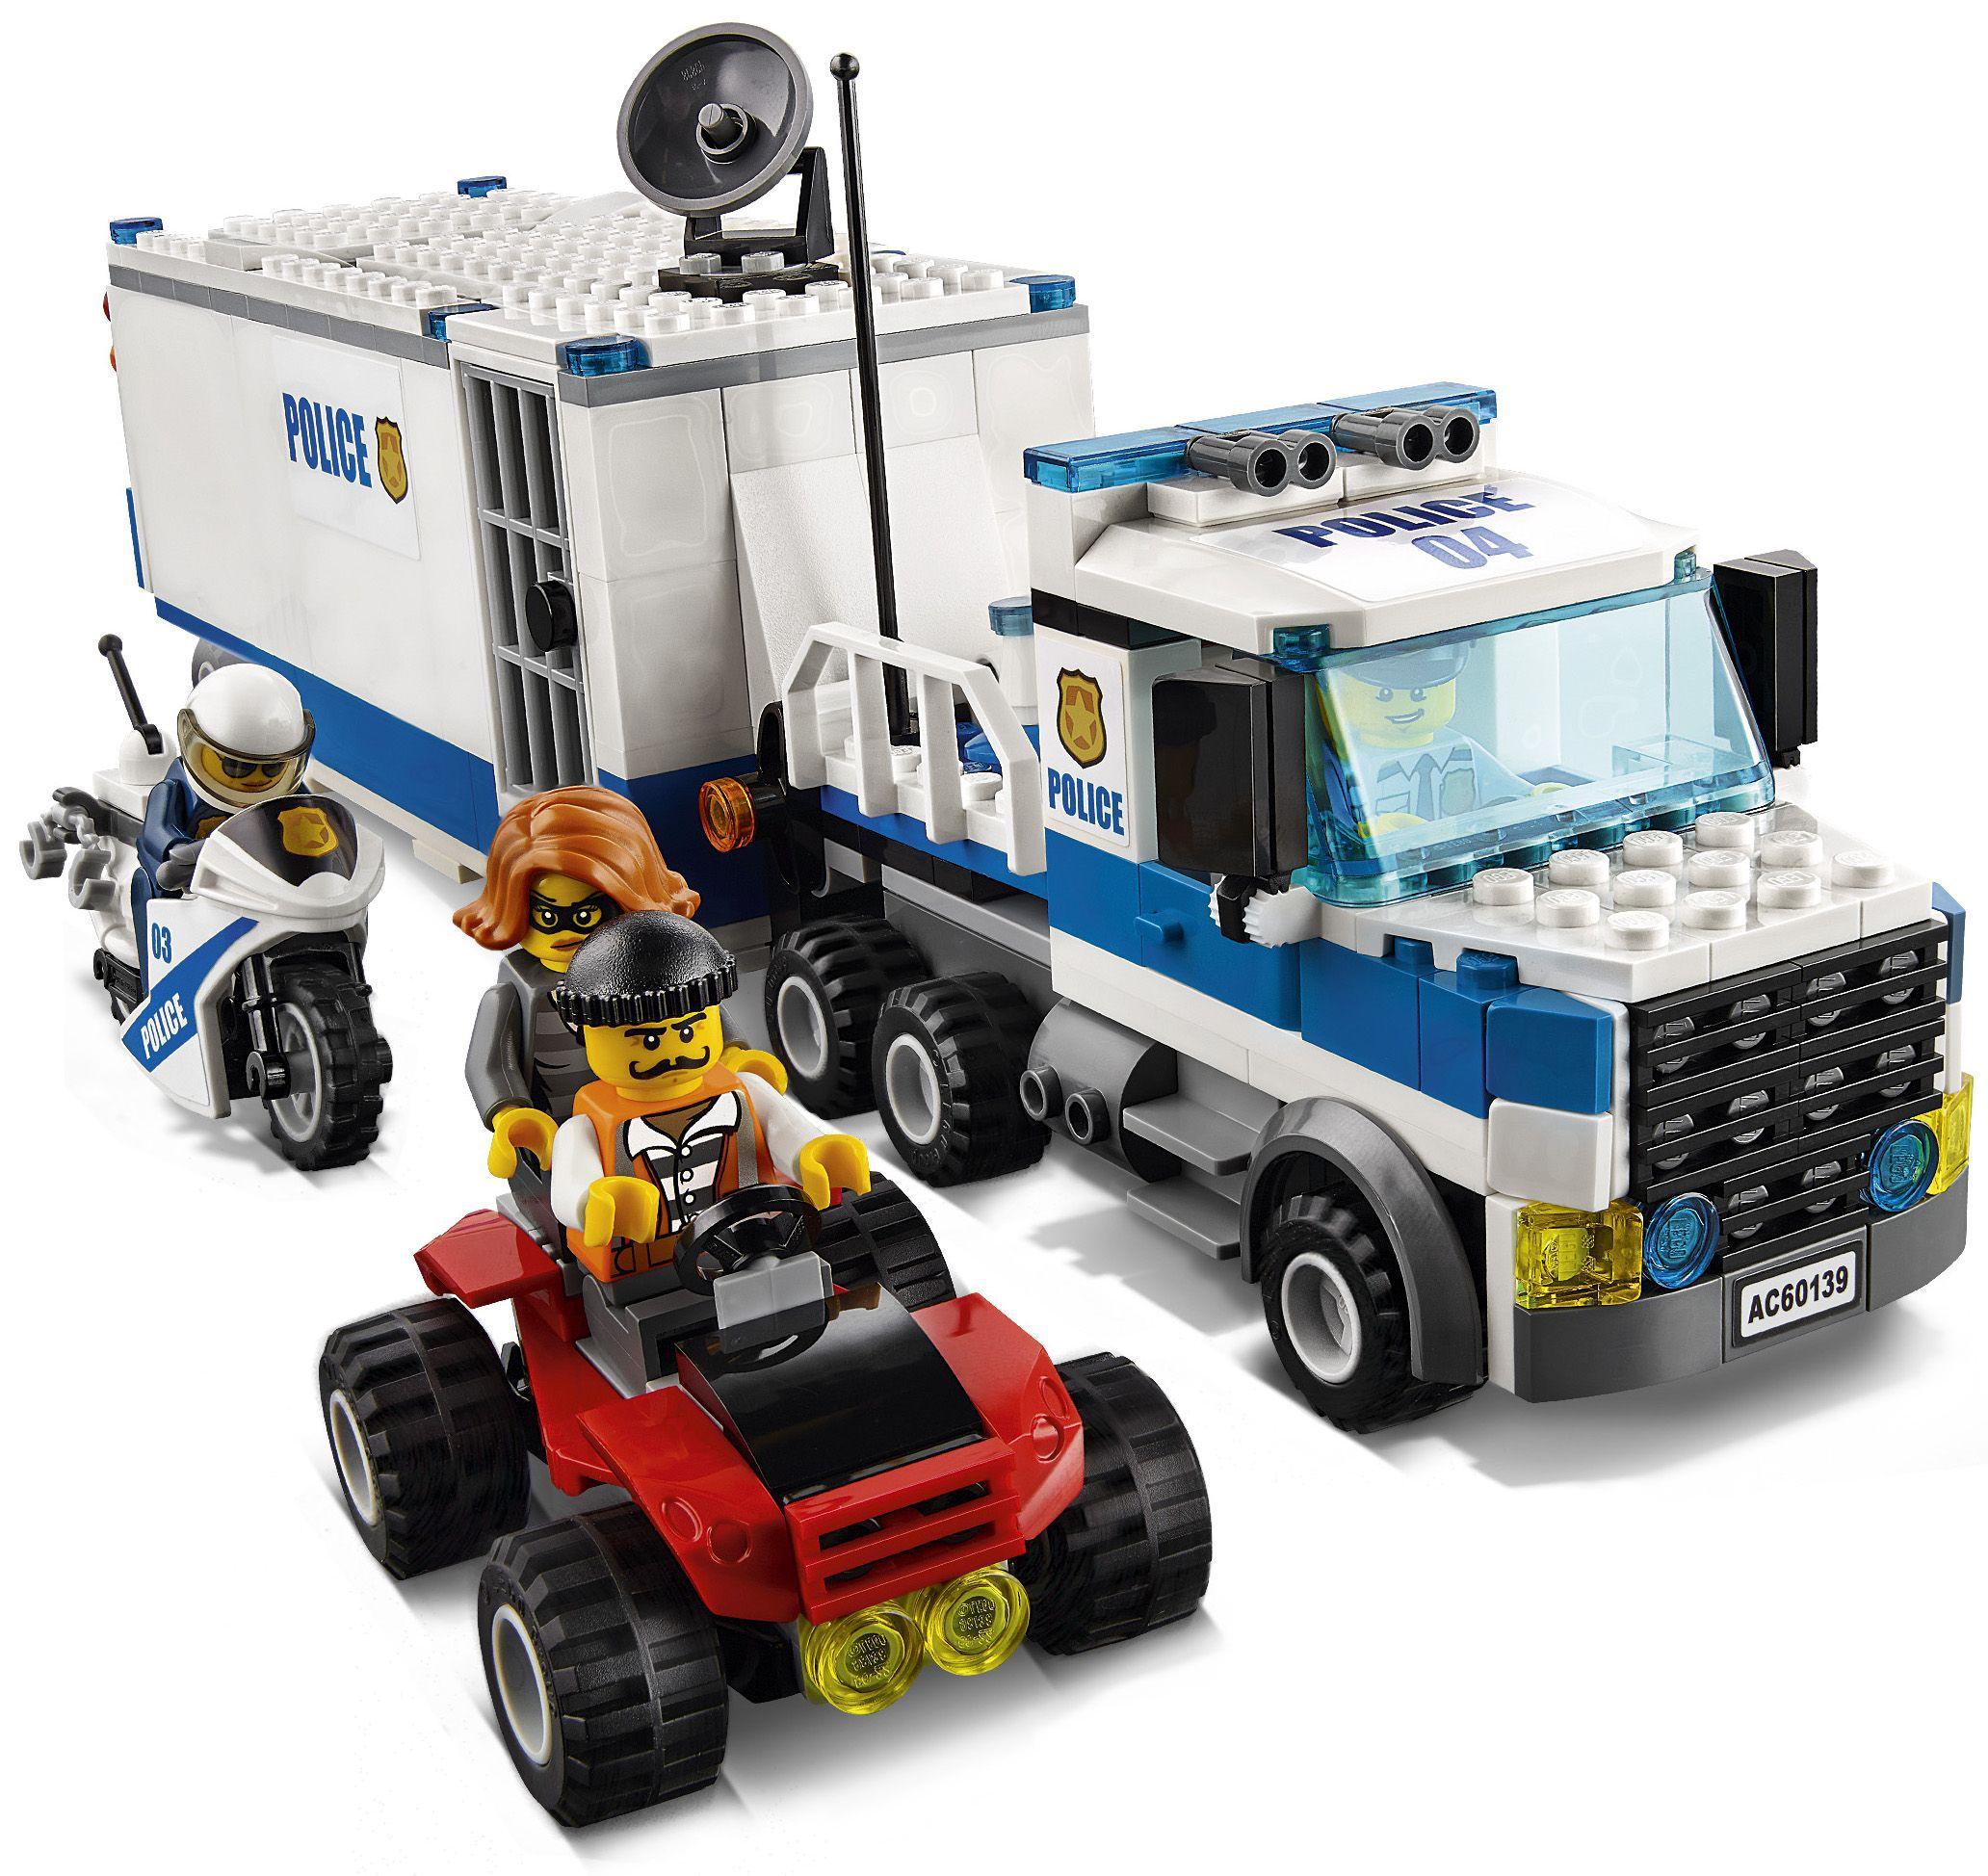 Le 60139 Achat Poste Mobile Commande Lego® City De Vente mNw8nv0O